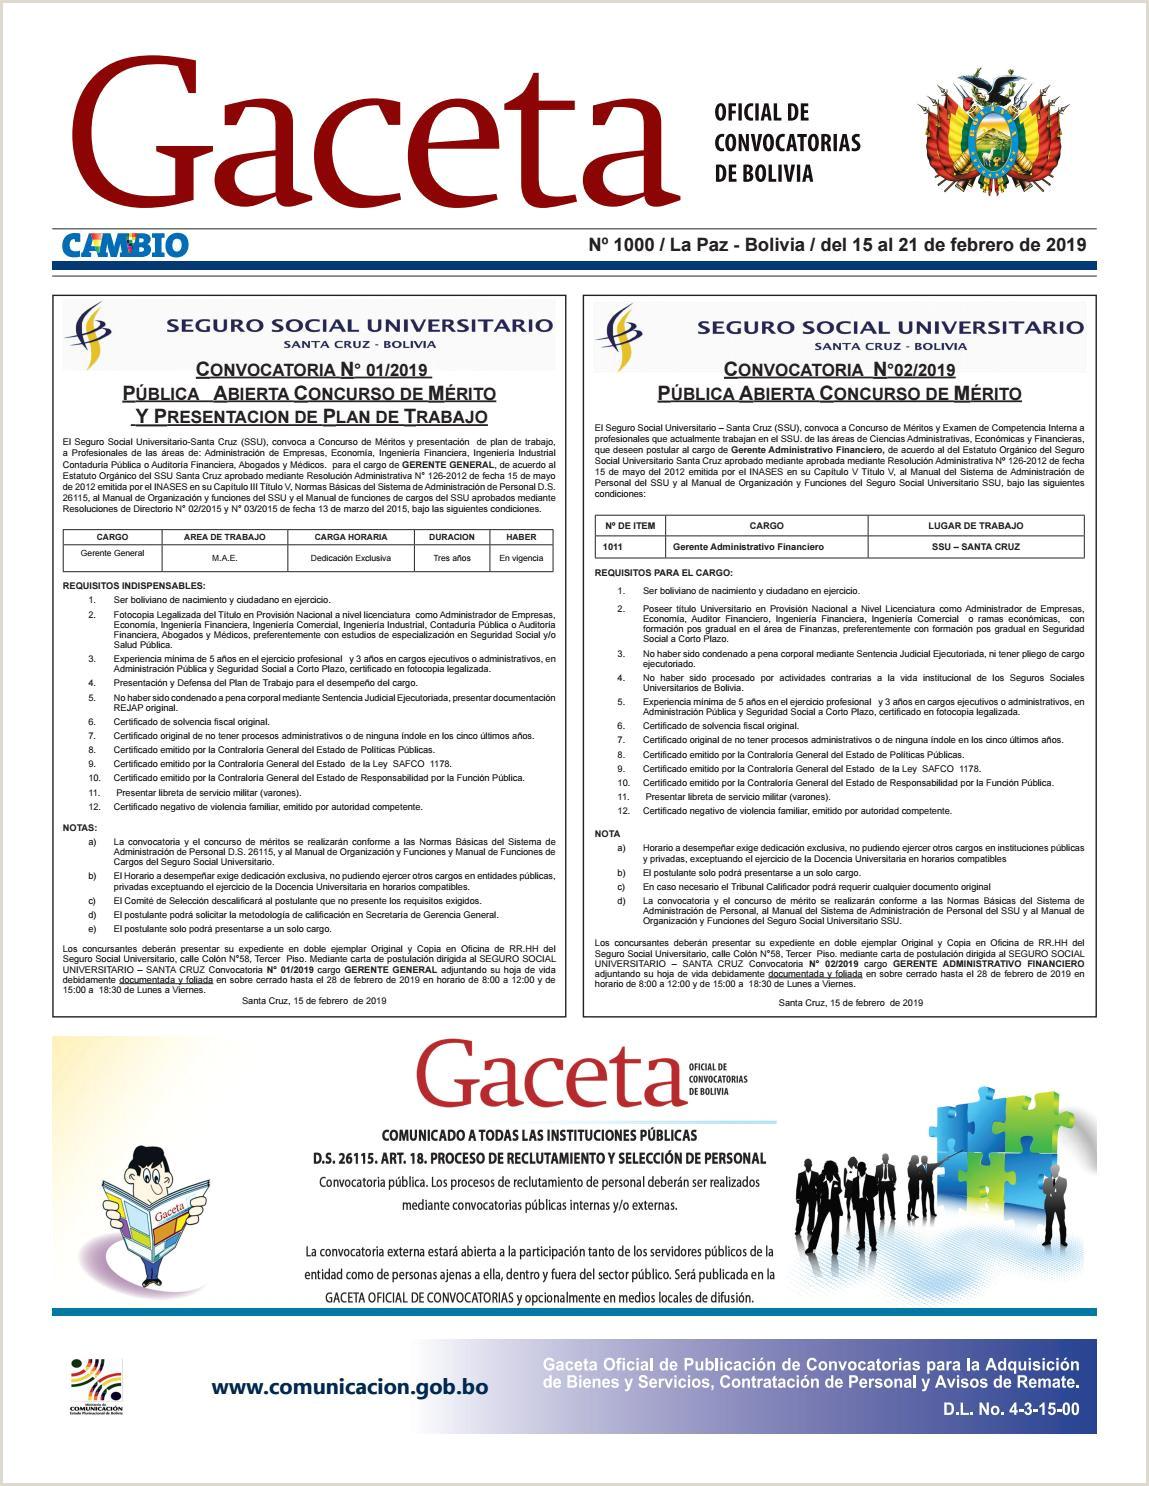 Gaceta icial de Convocatorias Edici³n Nº 1000 by Cambio